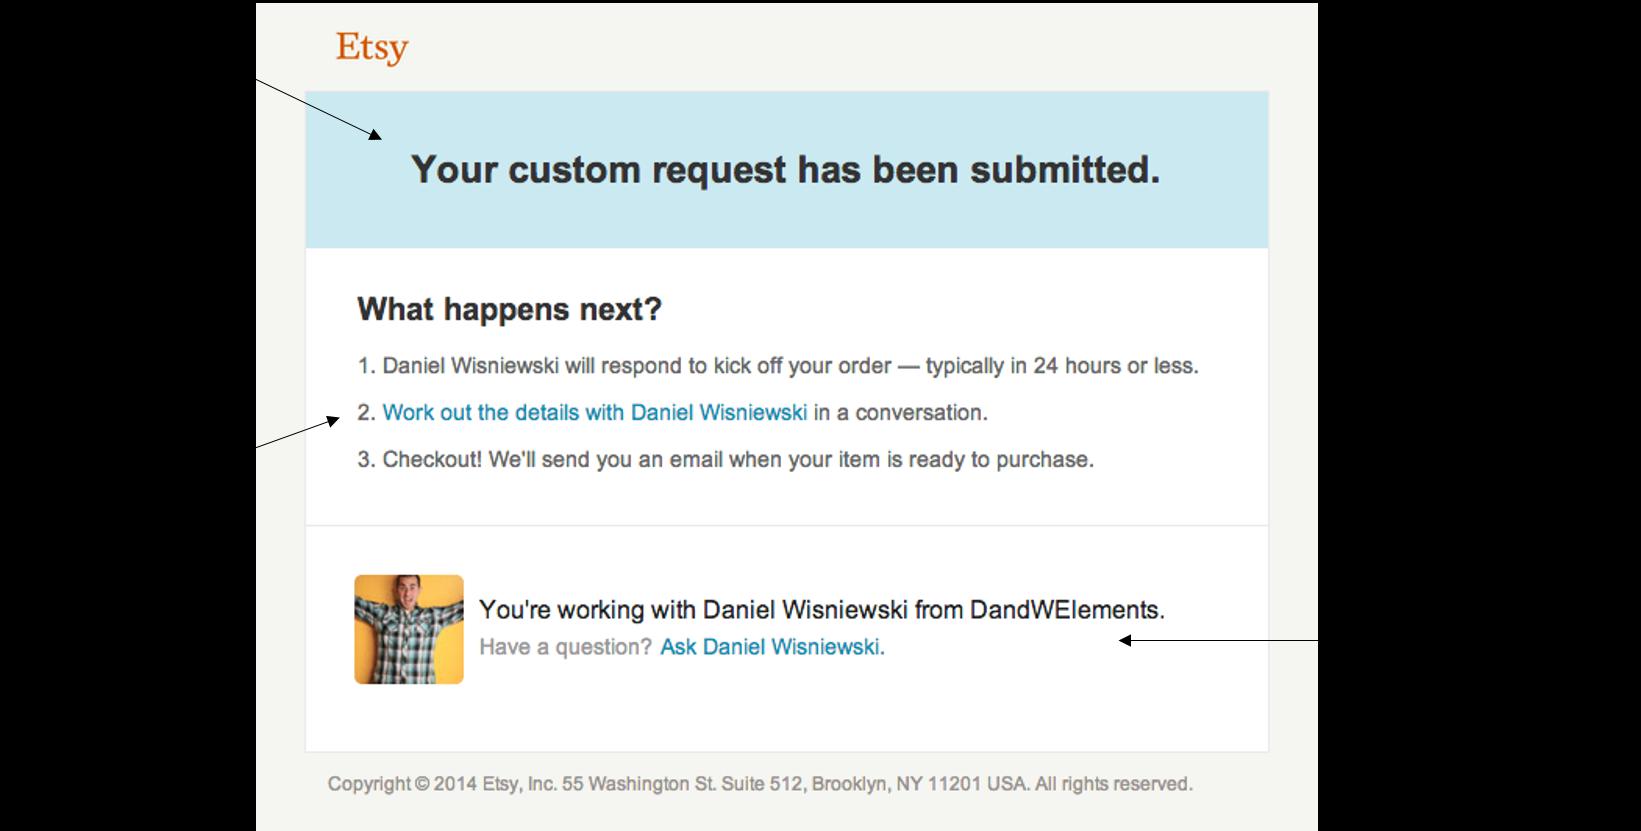 Etsy email screenshot